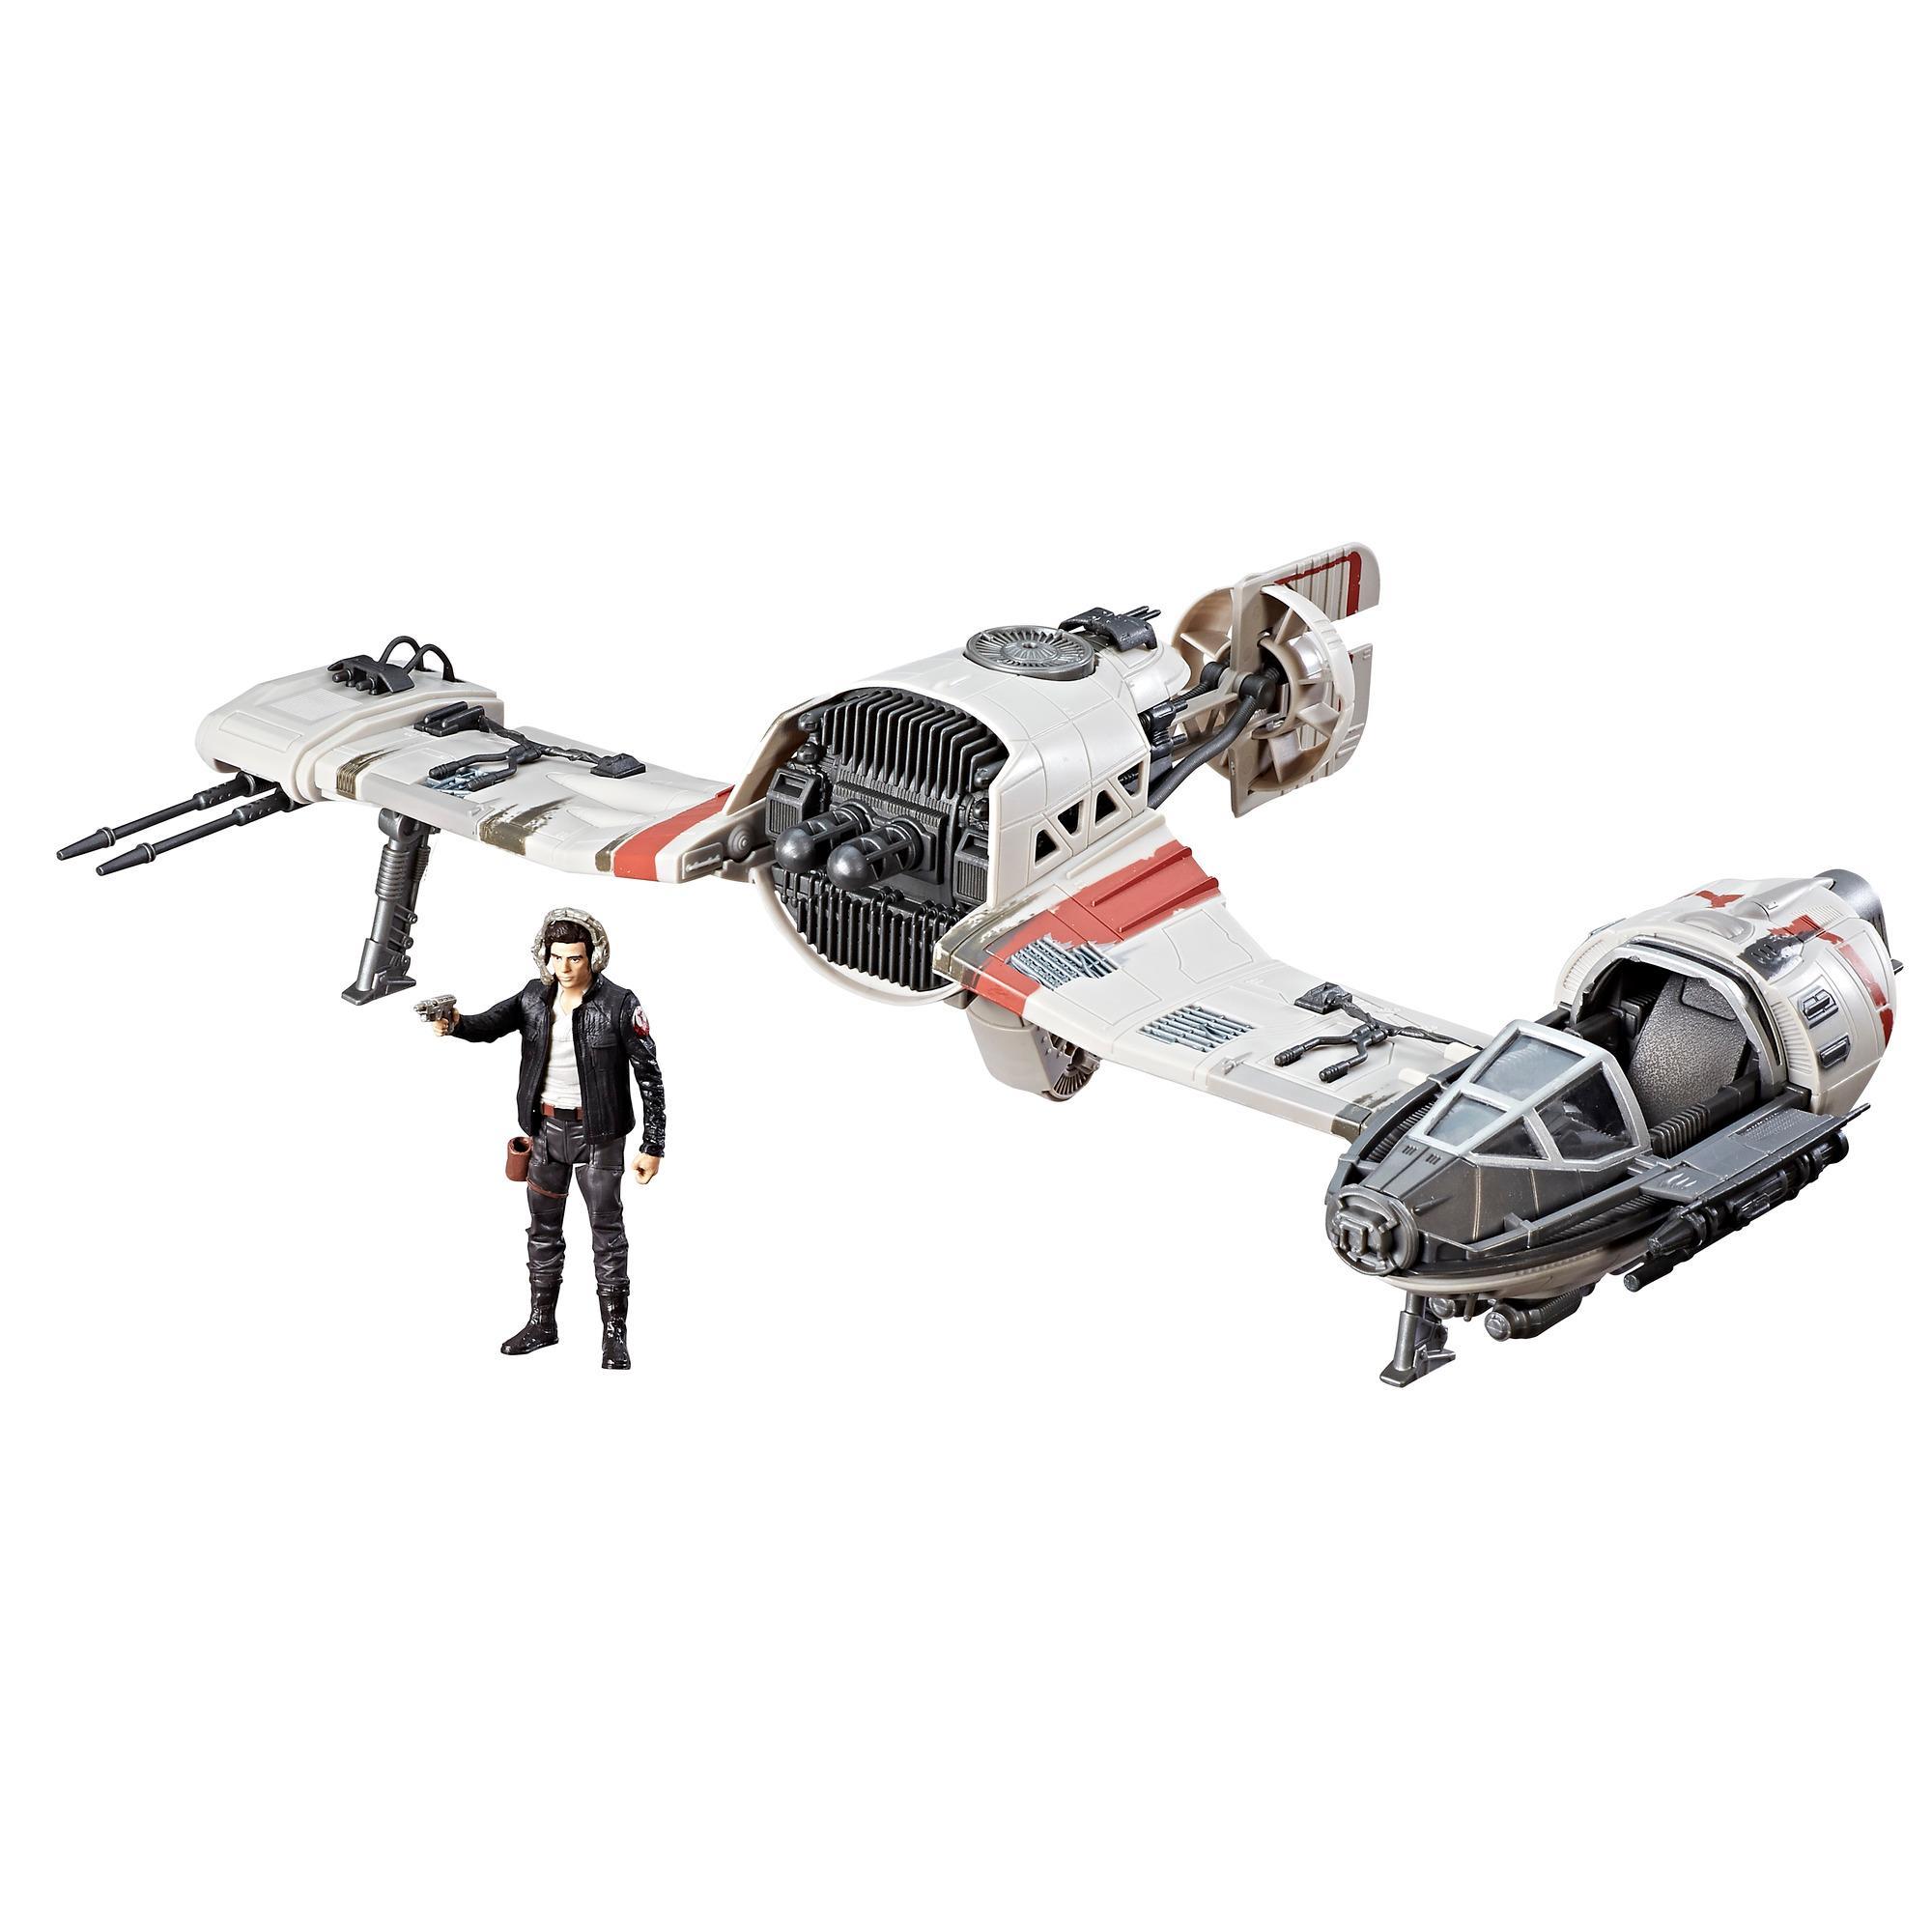 Star Wars Force Resistance Ski Speeder and Captain Poe Dameron Figure